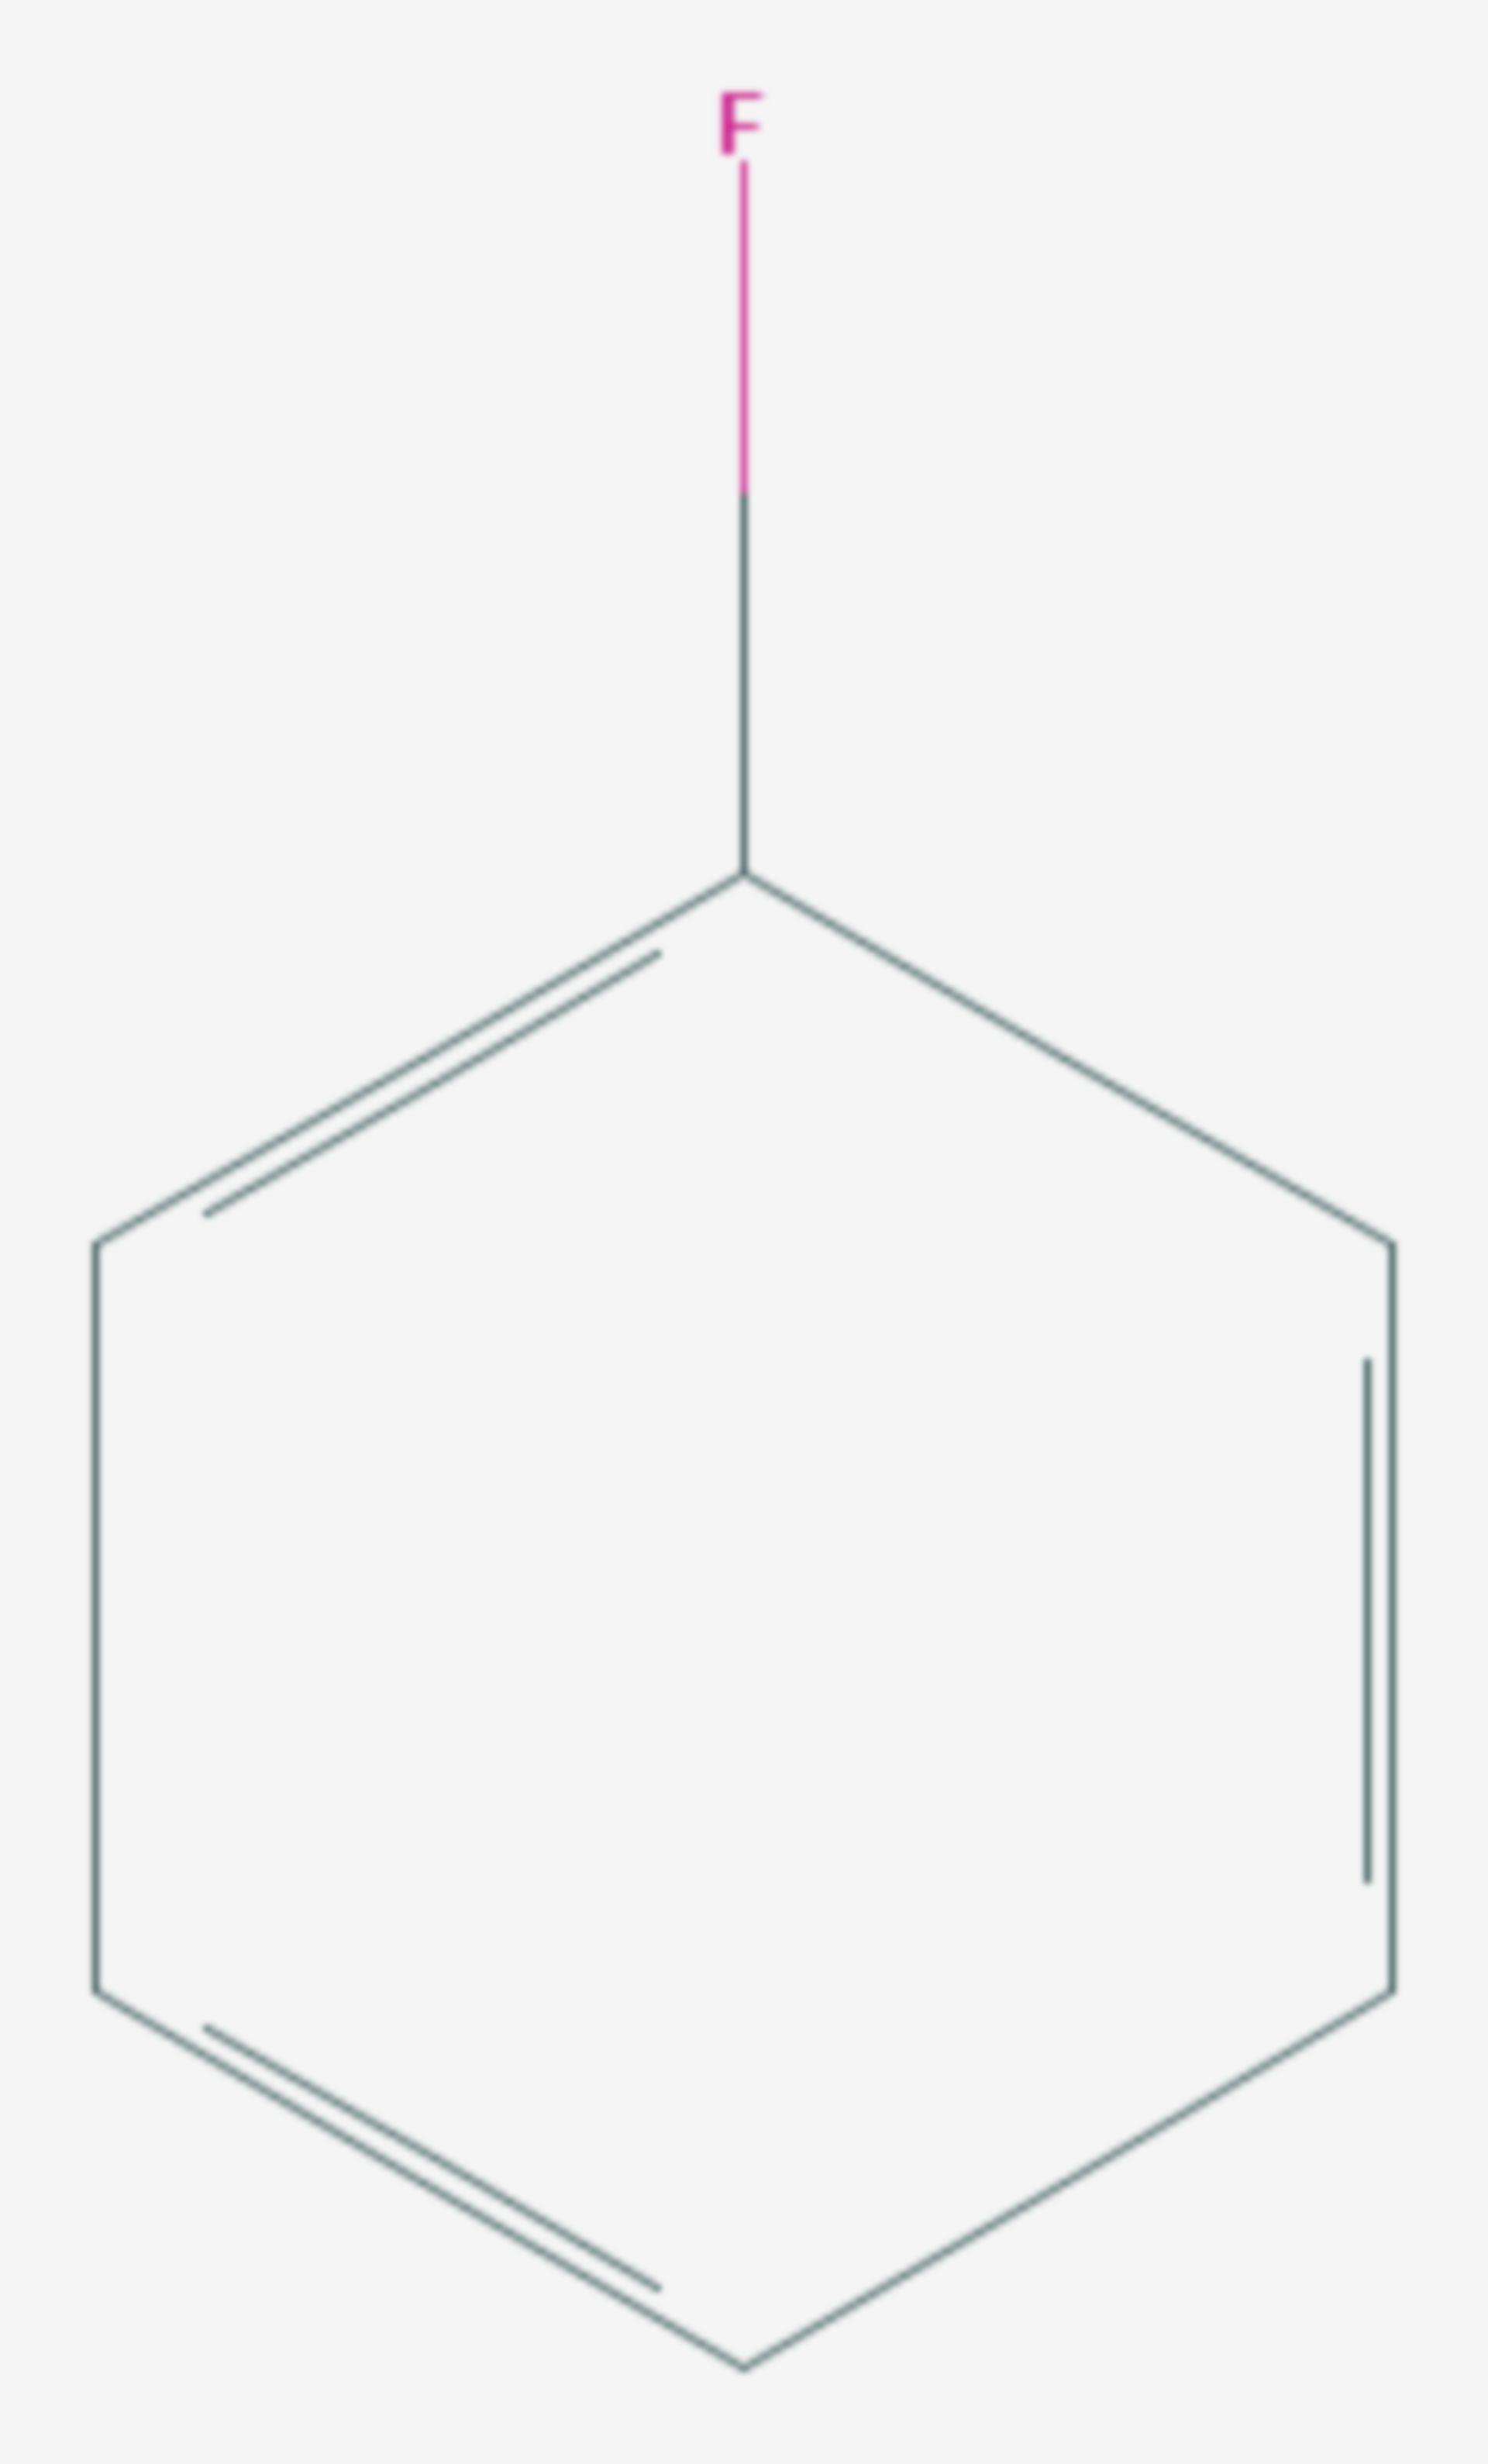 Fluorbenzol (Strukturformel)